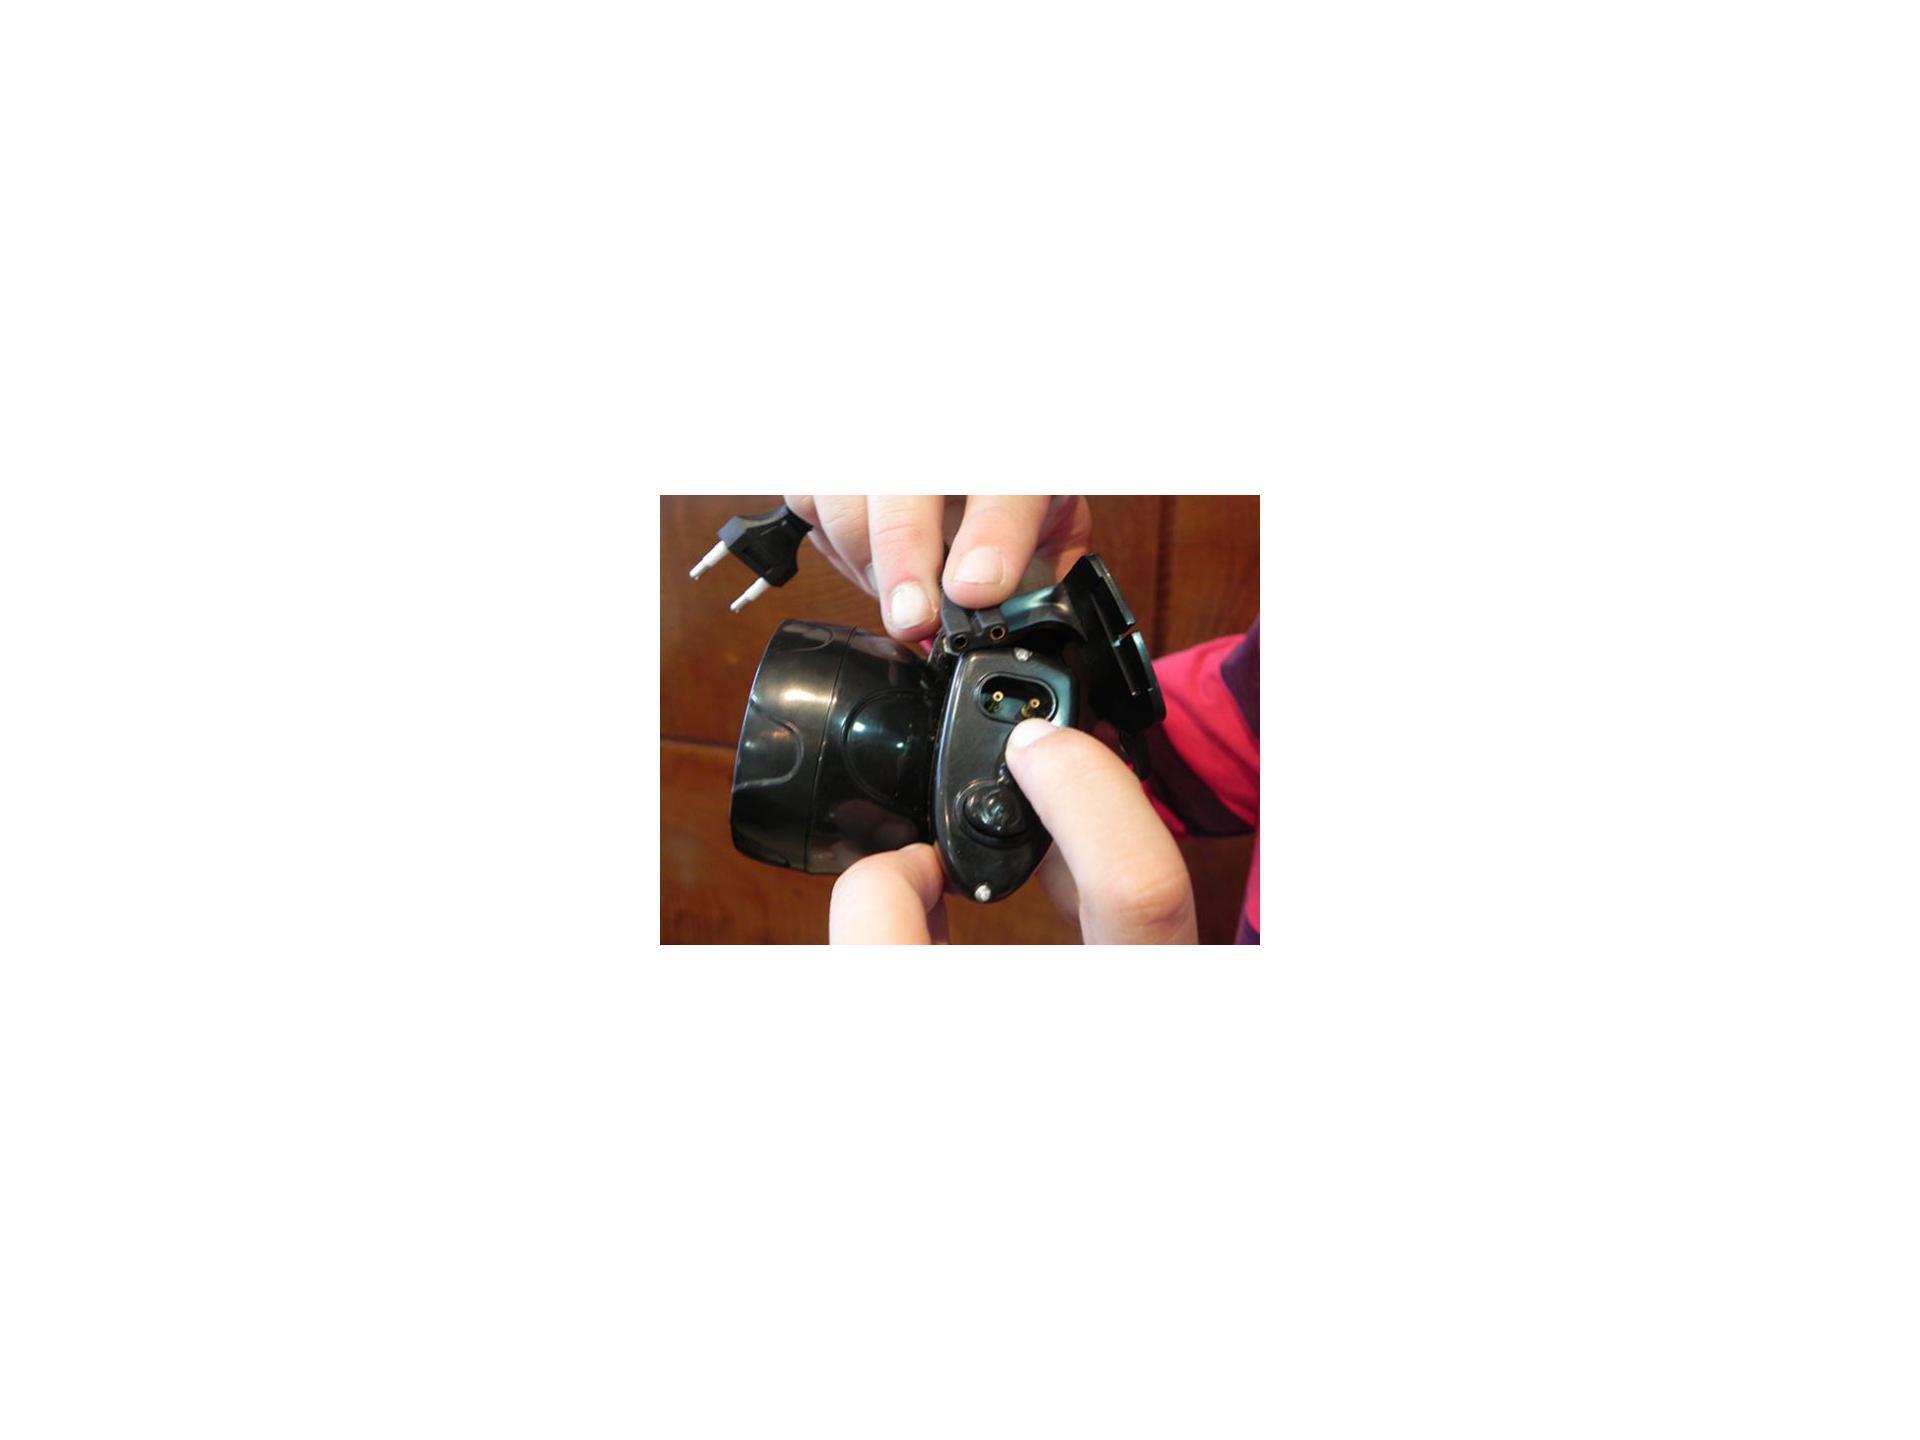 Lanterna Nautika De Cabeça Recarregável Fenix 5 Led`s